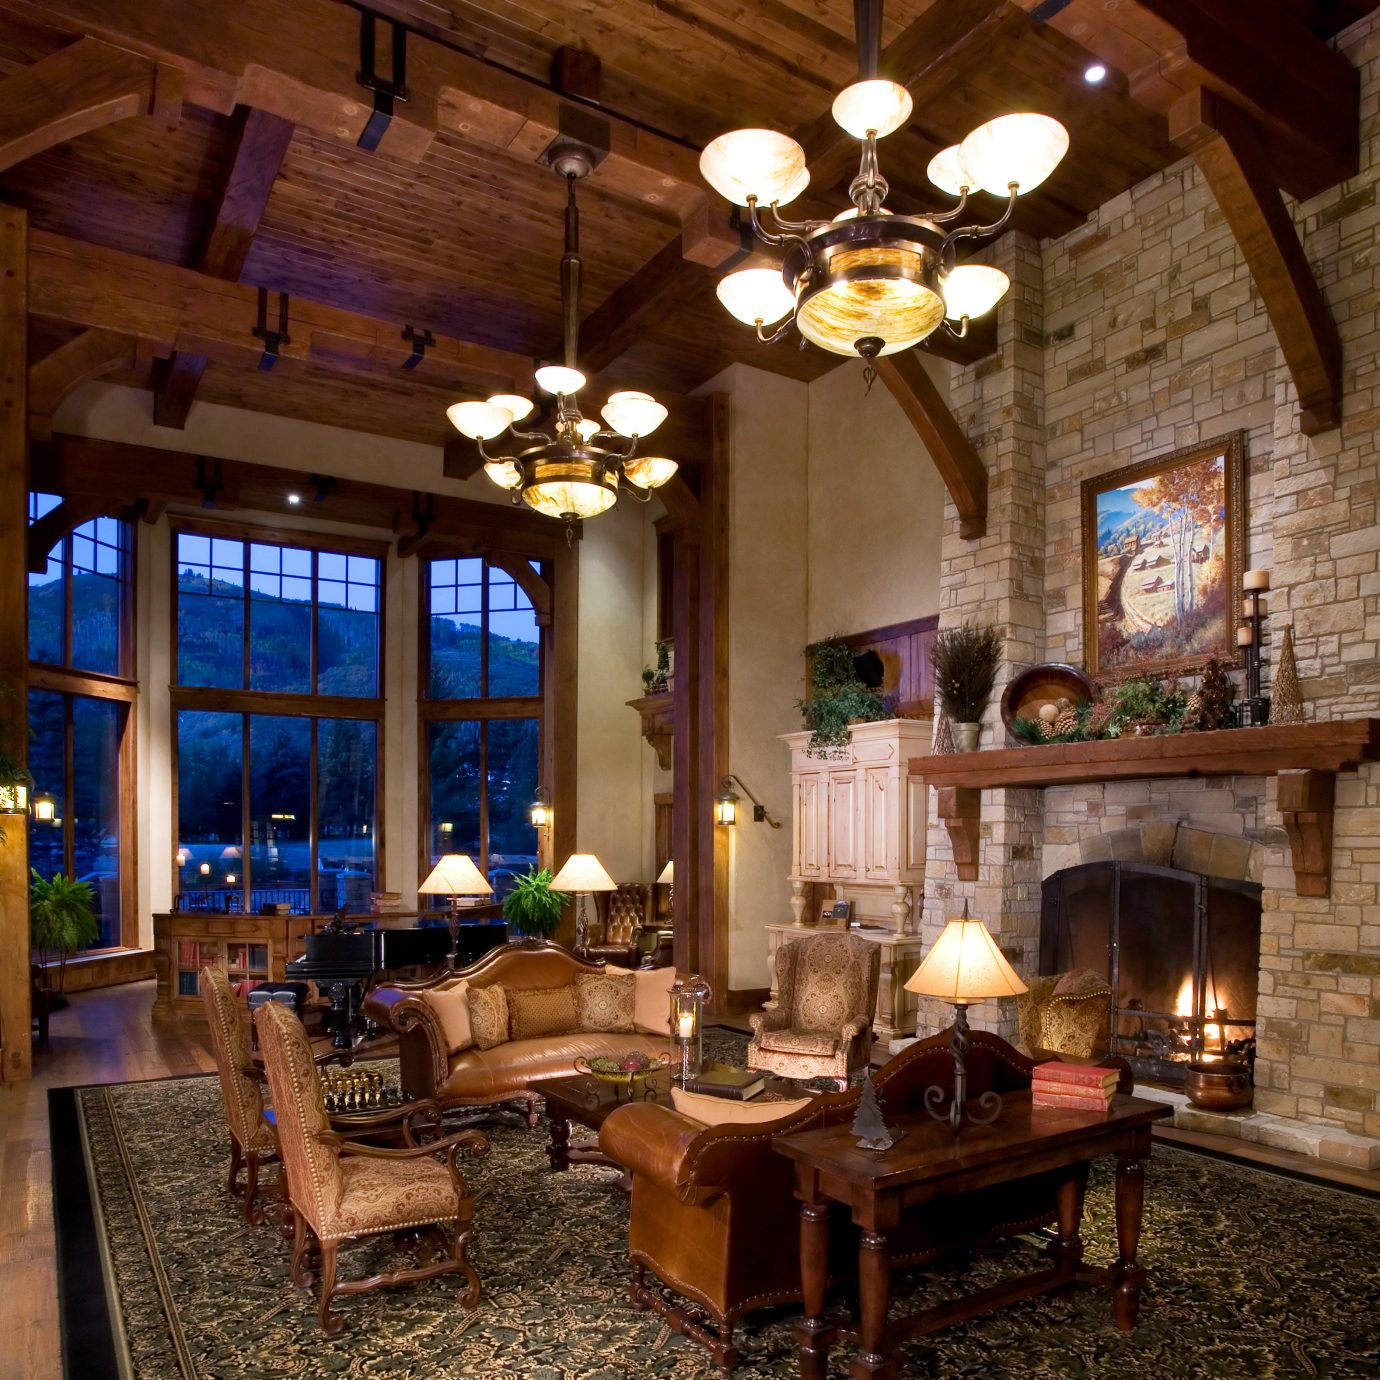 Fireplace property building home house living room lighting cottage farmhouse restaurant mansion log cabin Resort Lobby Villa